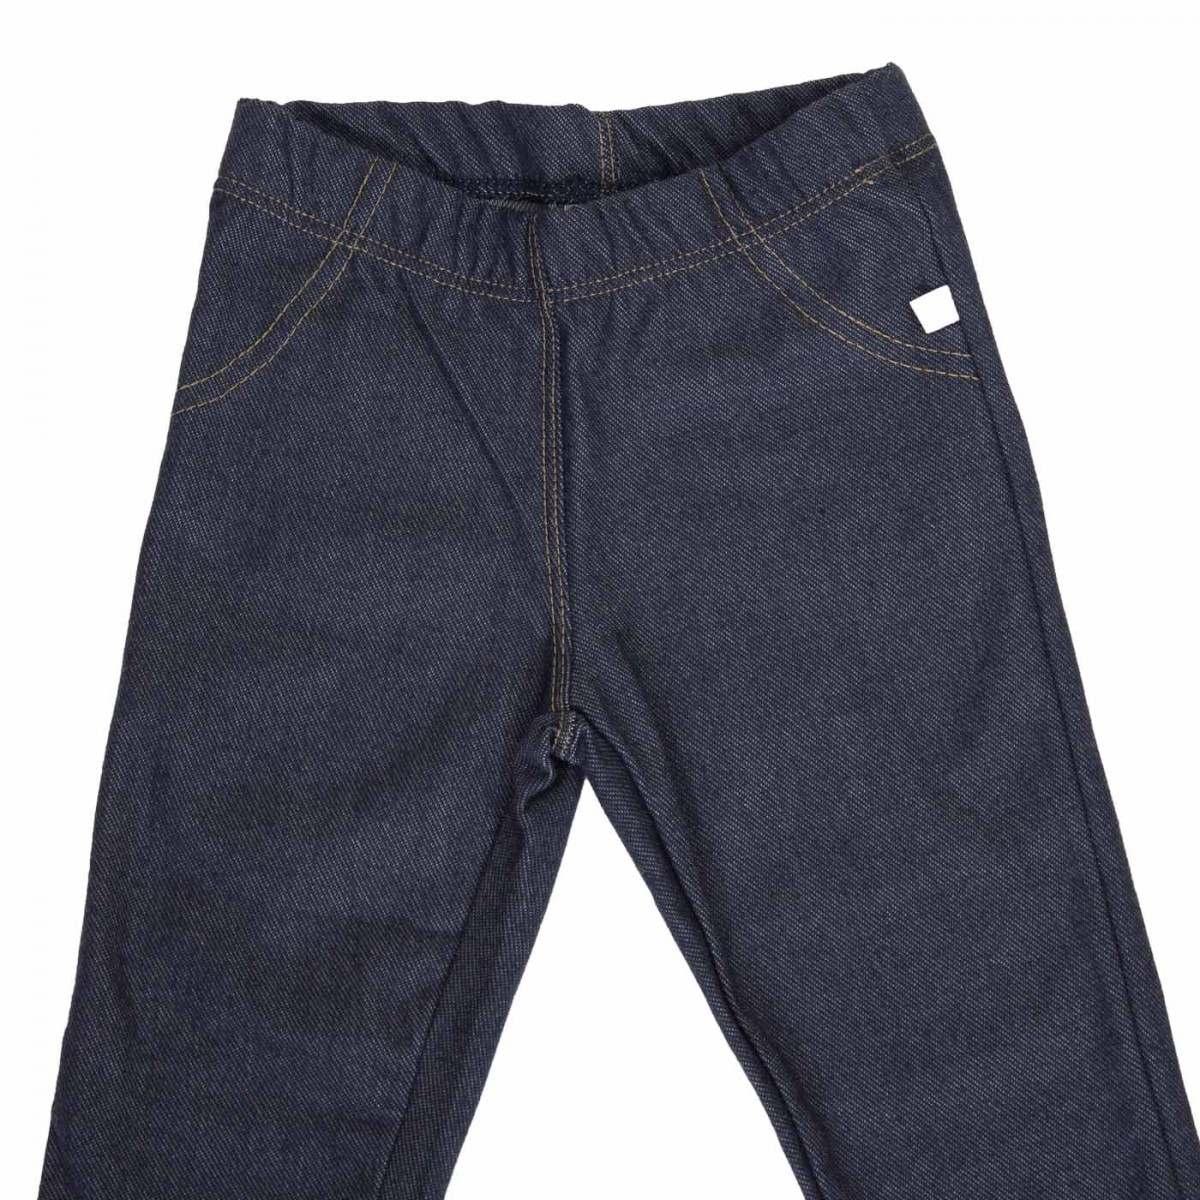 b64244113 legging jeans infantil feminino hering kids 559kau807. Carregando zoom.